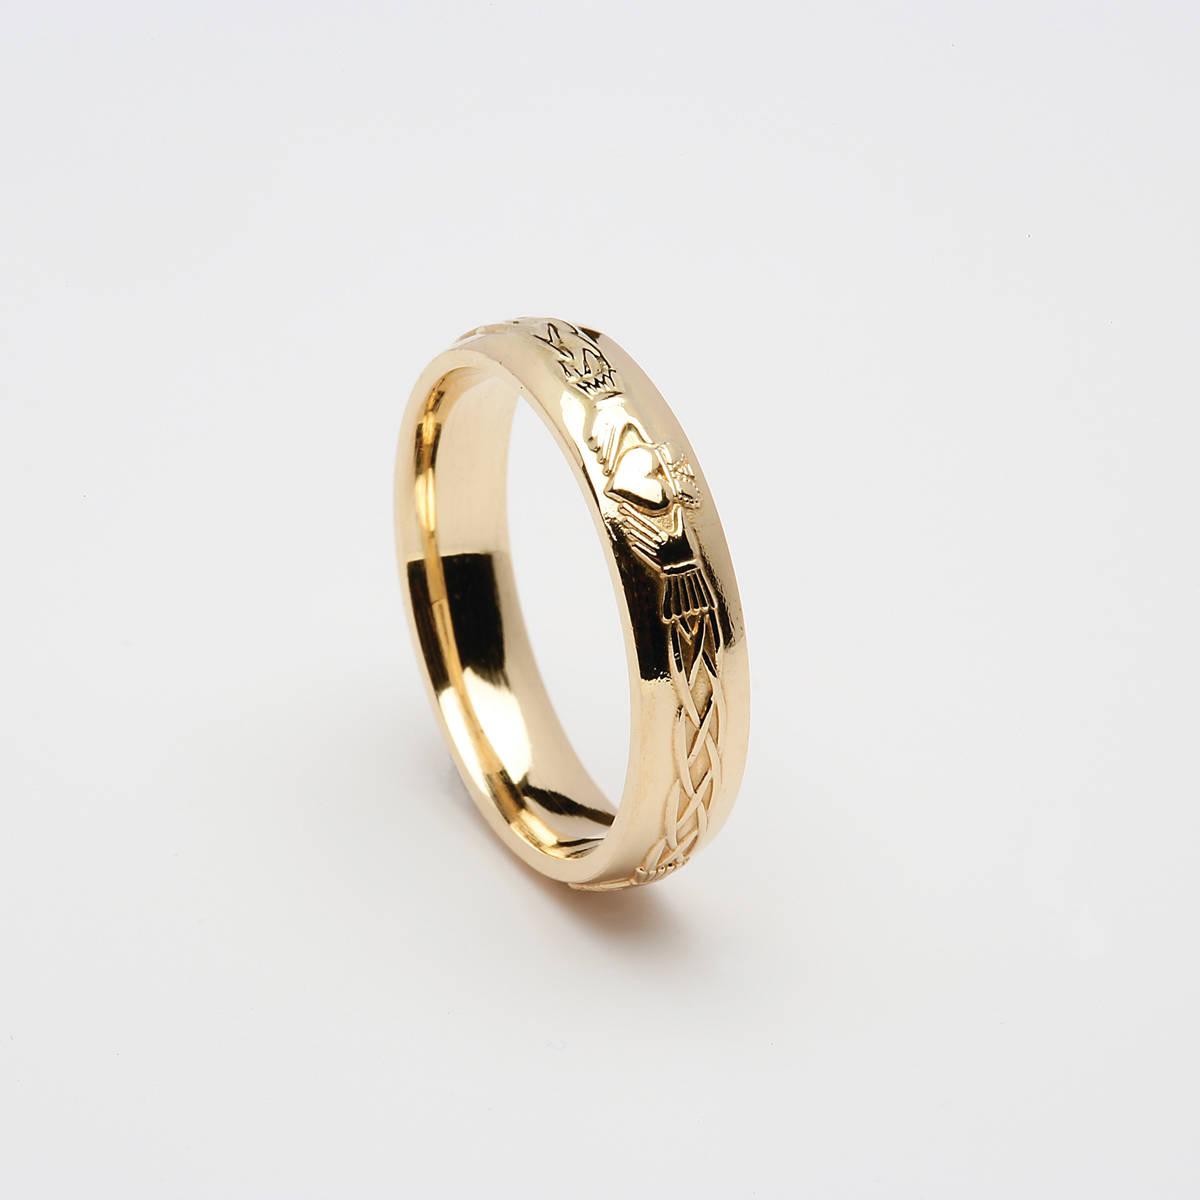 18ct yellow gold ladies/unisex Celtic Claddagh wedding band  Width: 4.5mm